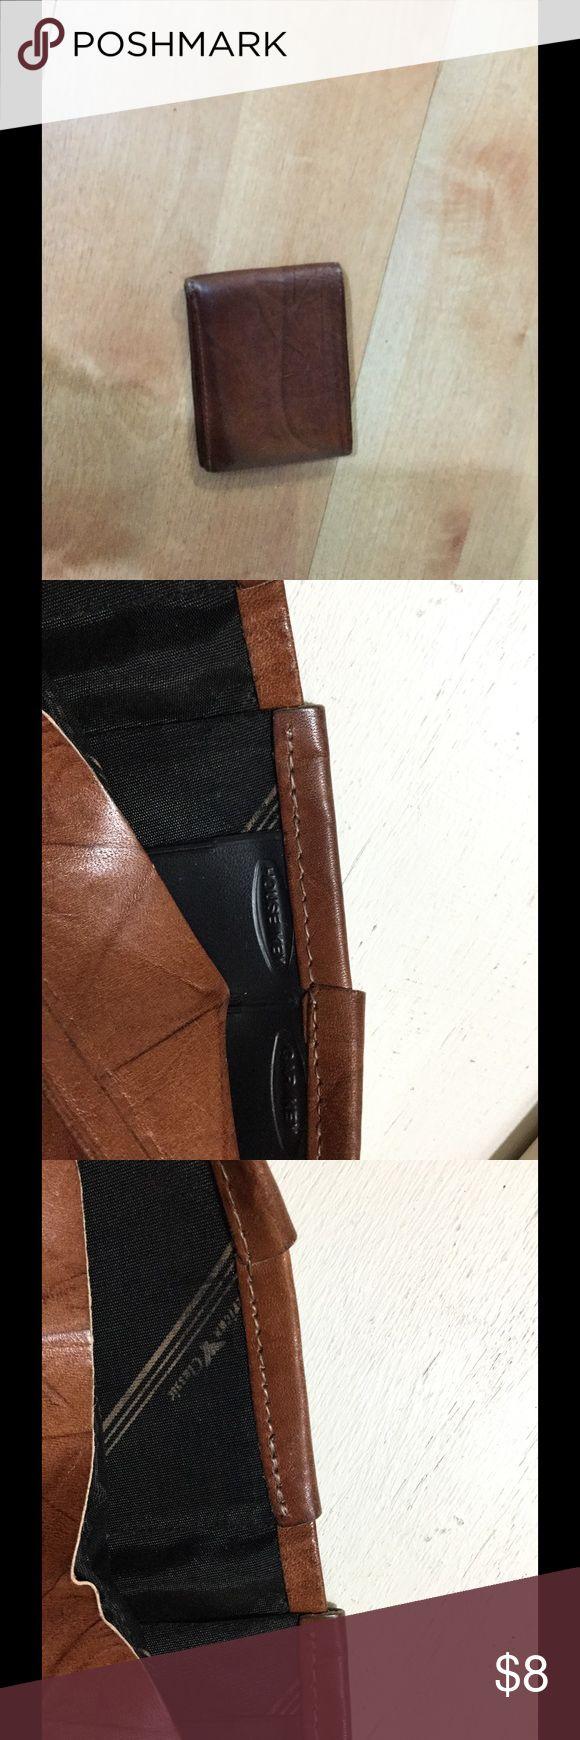 Rolf's wallet Rolf's wallet  American classic Bags Wallets